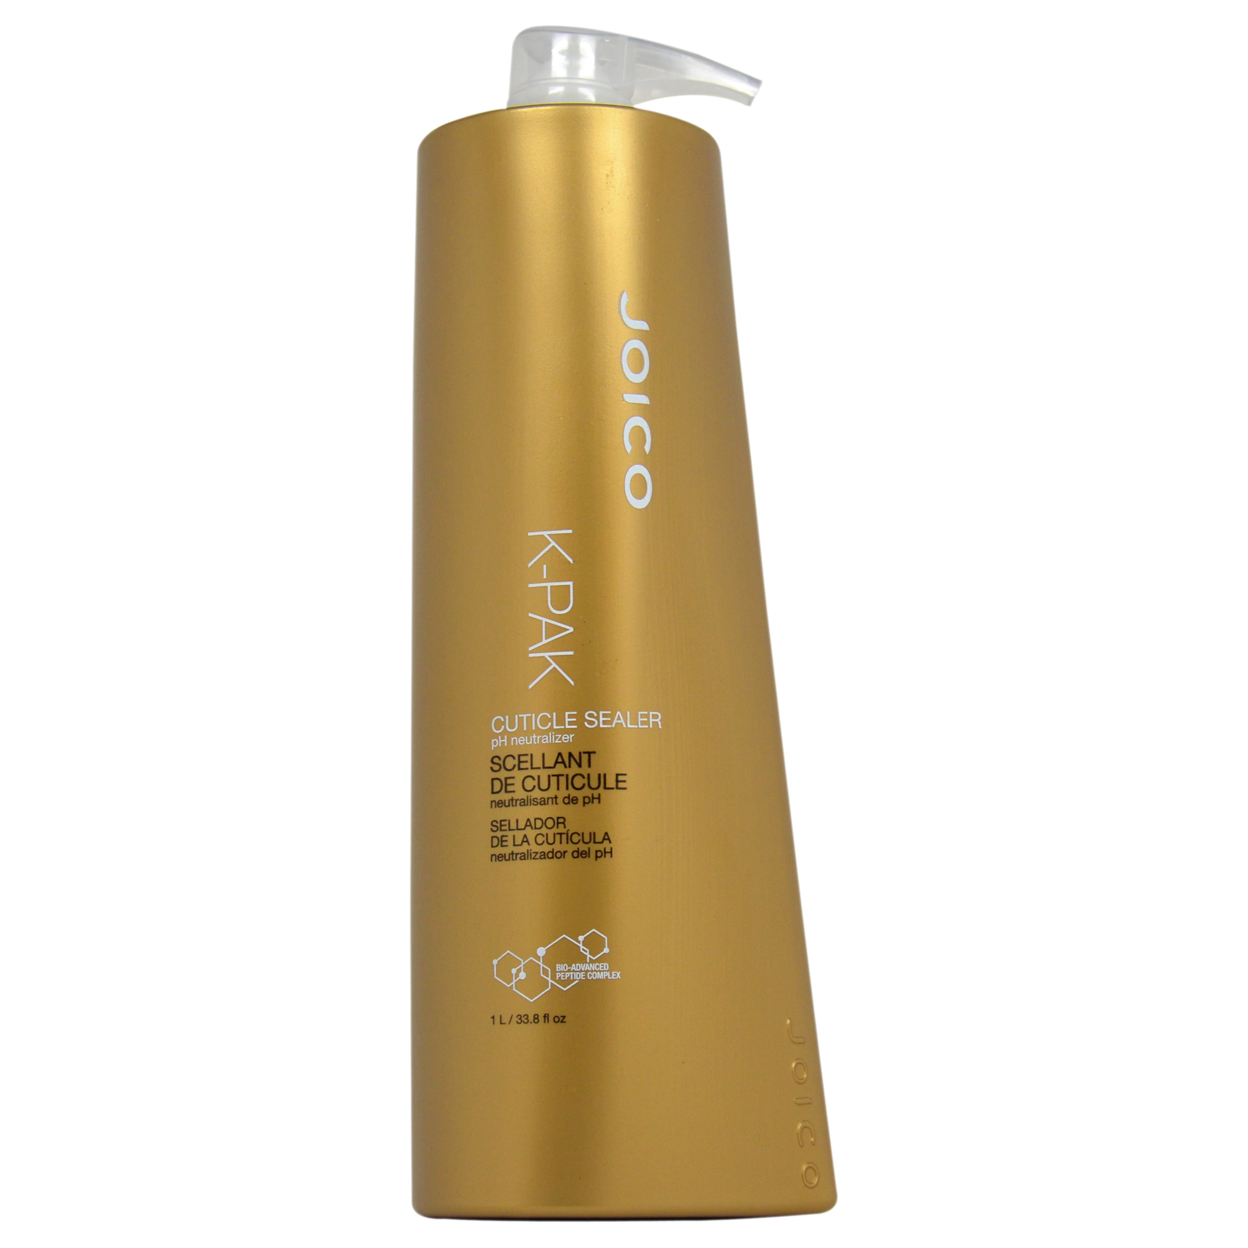 K-Pak Cuticle Sealer pH Neutralizer by Joico for Unisex - 33.8 oz Neutralizer 583c6c5ce2246159f435cb6c